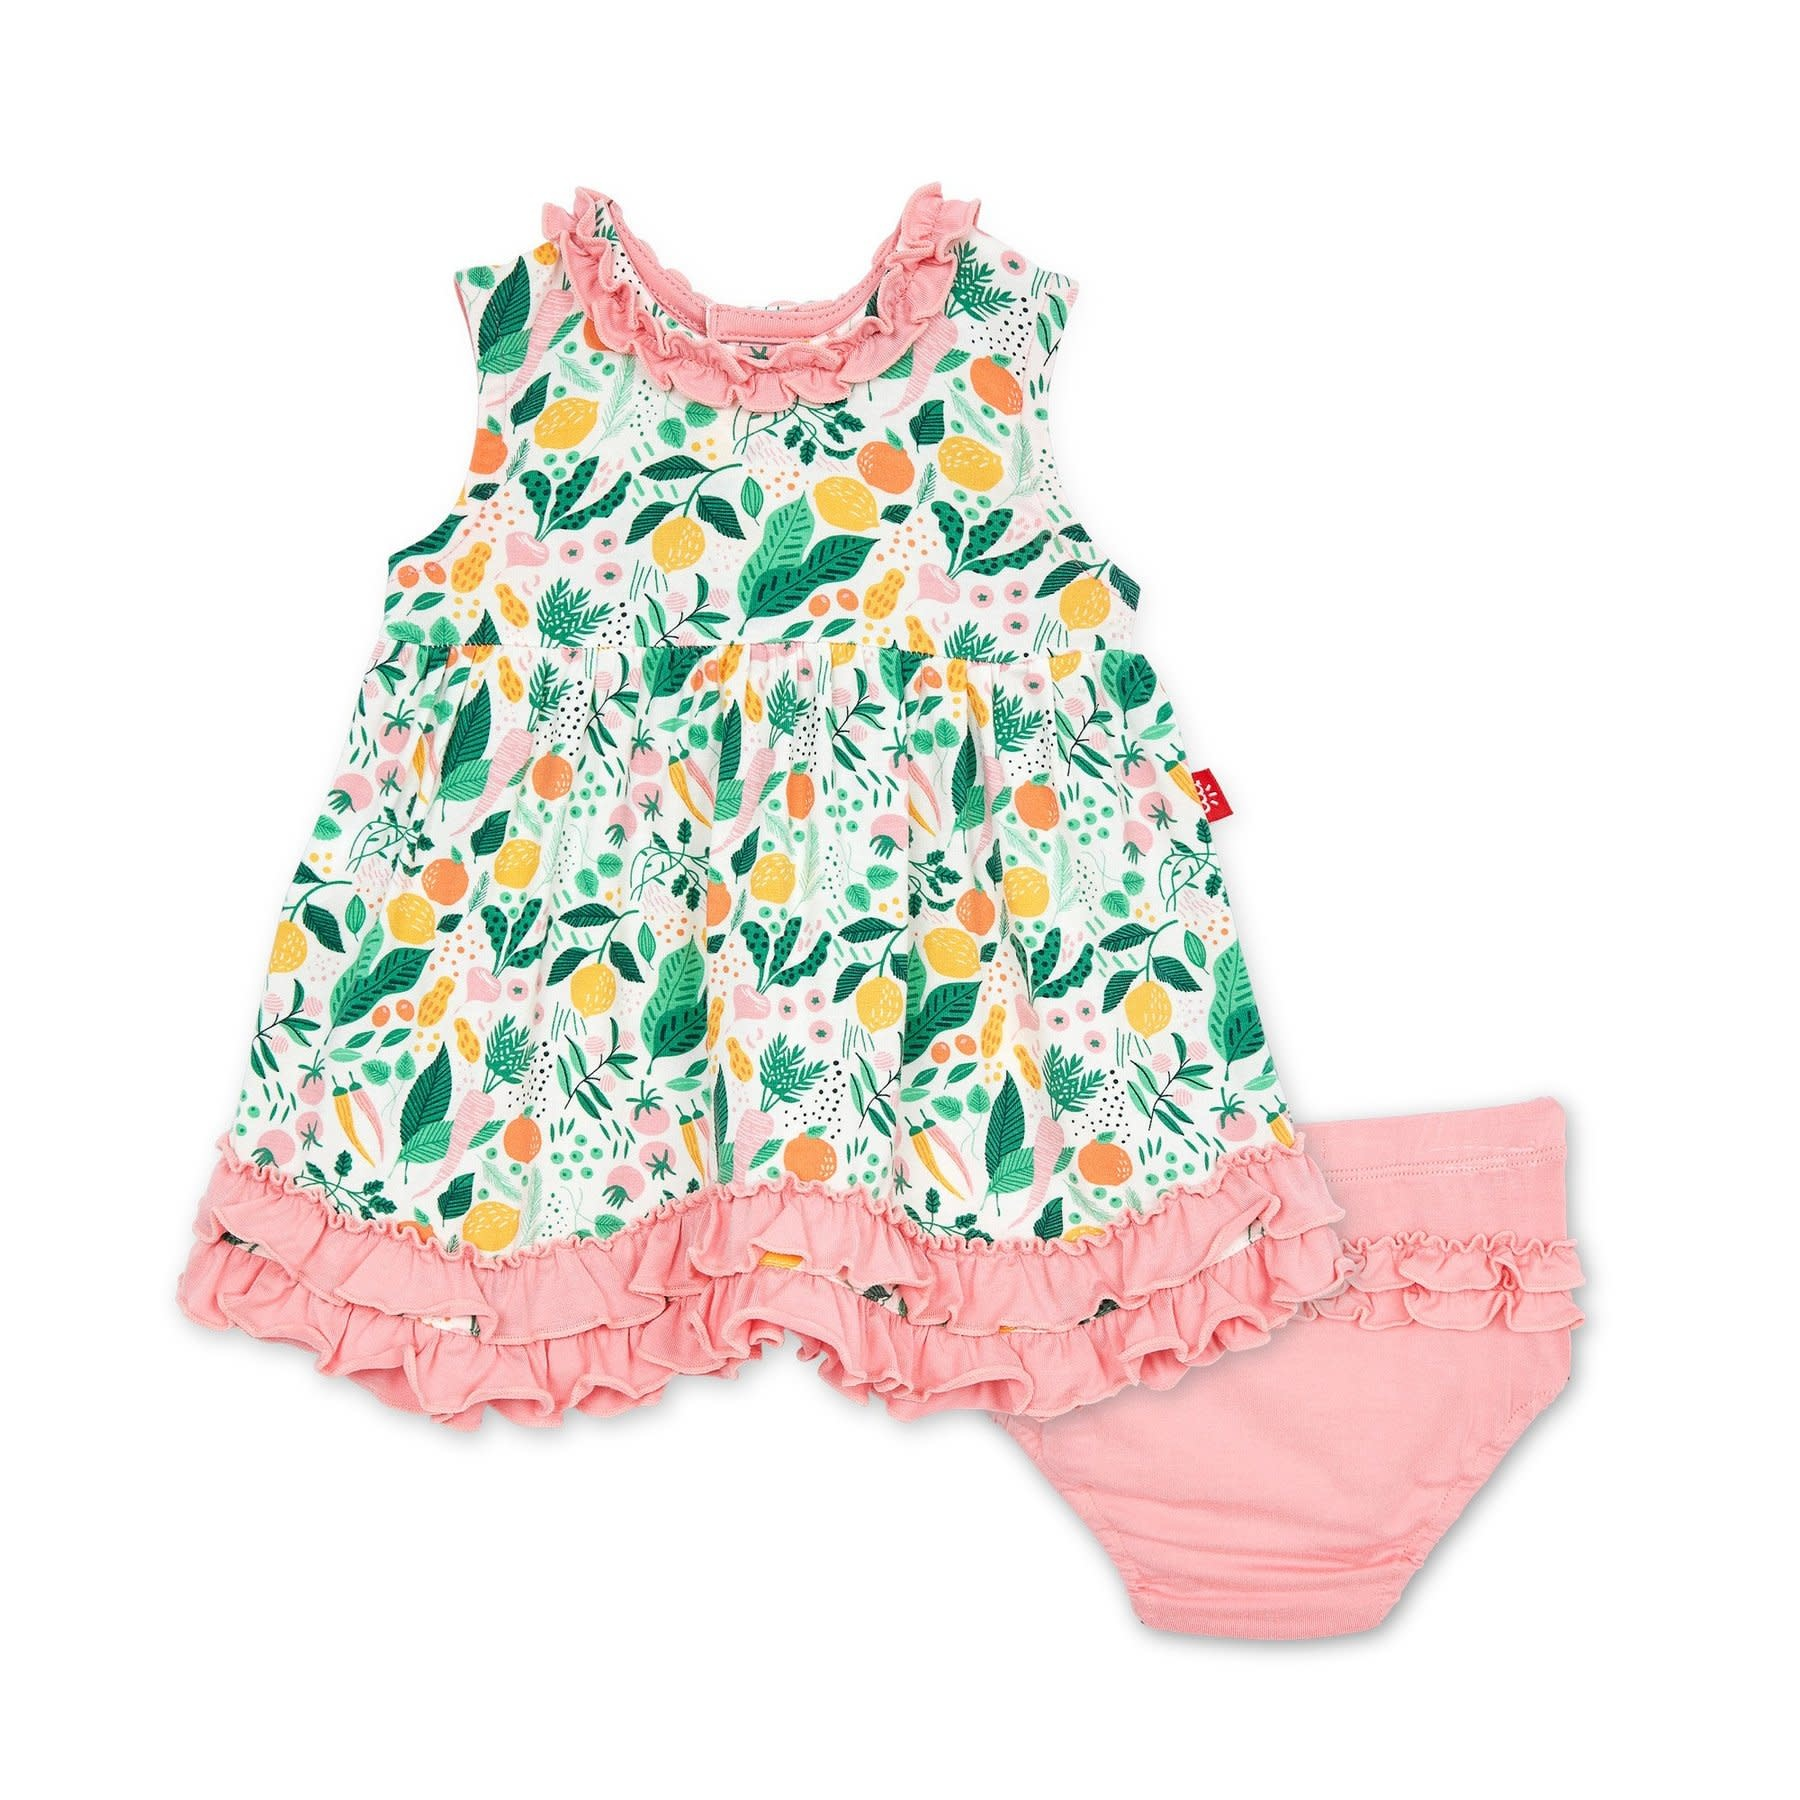 Magnificent Baby Dress Set